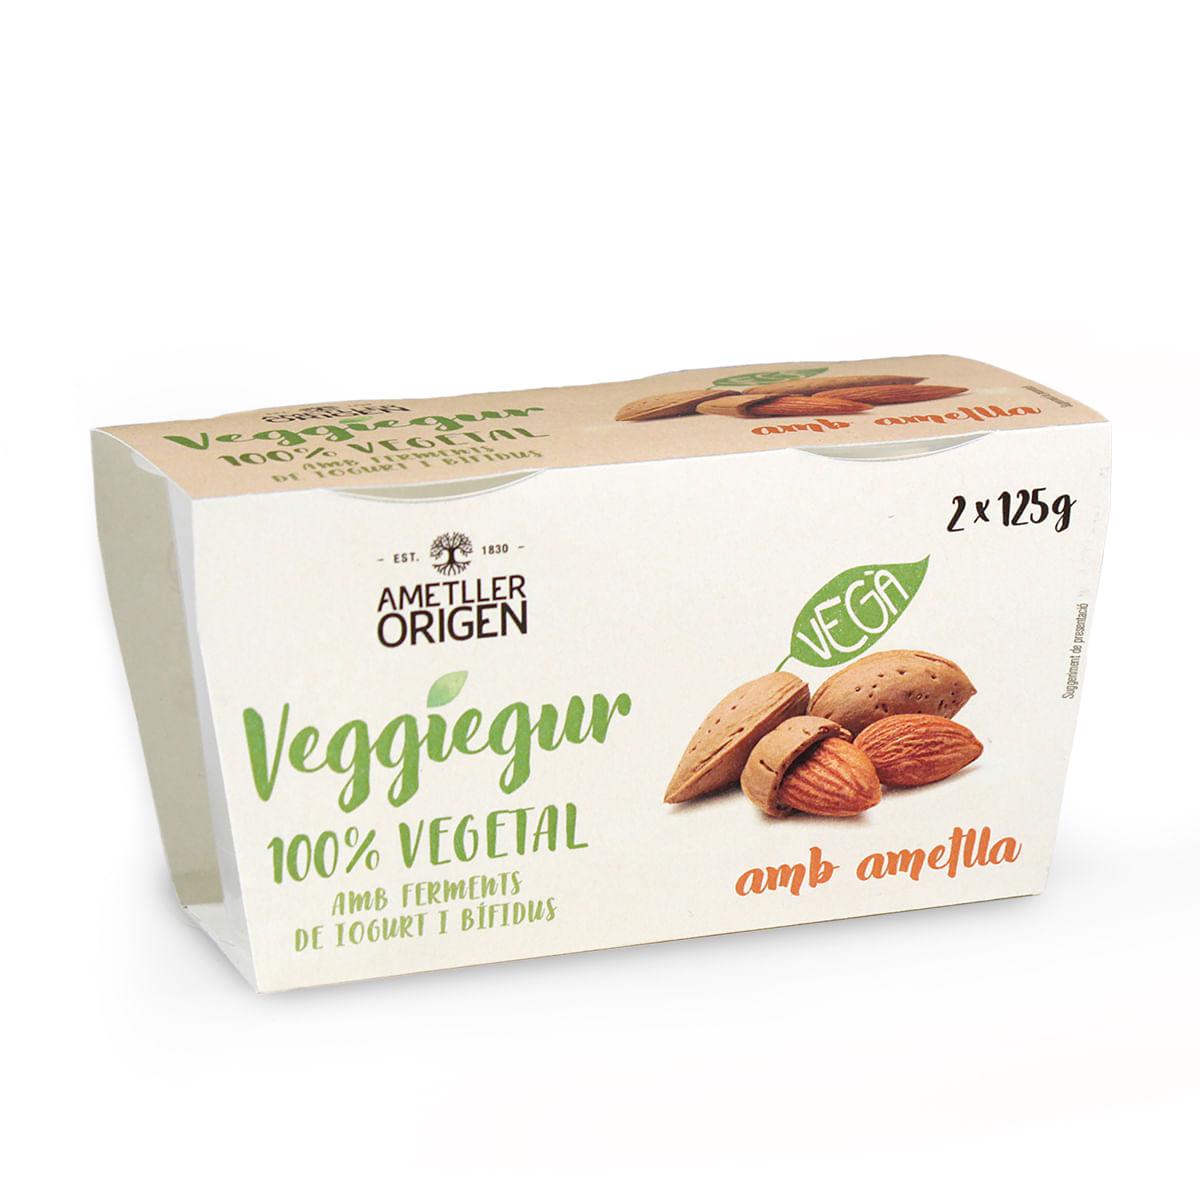 veggiegur-ametlla